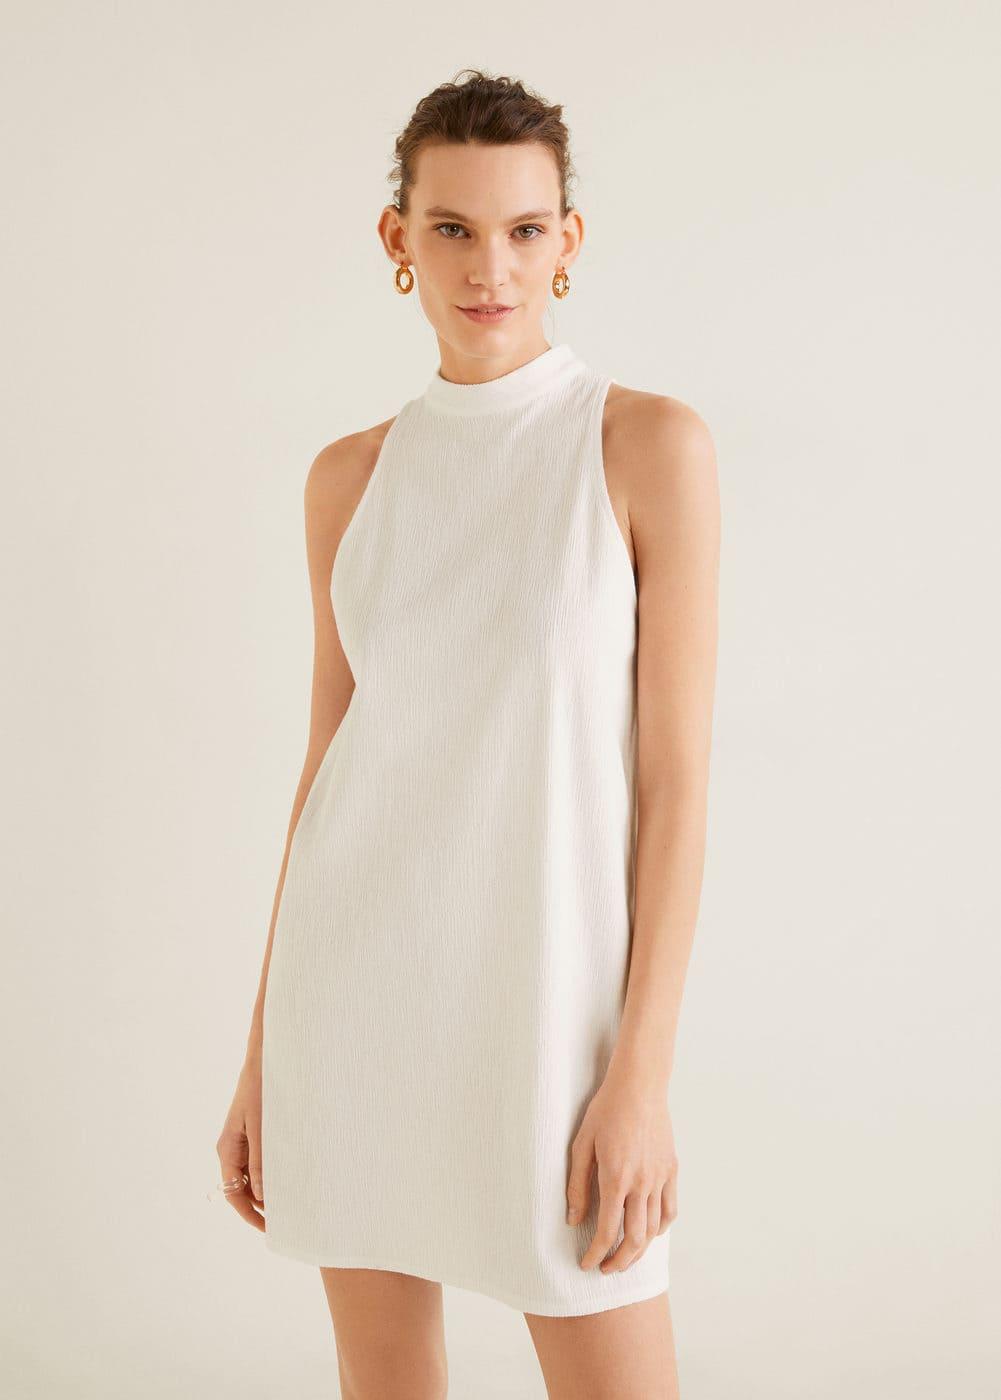 Perkins neck dress -  Woman | OUTLET Estonia